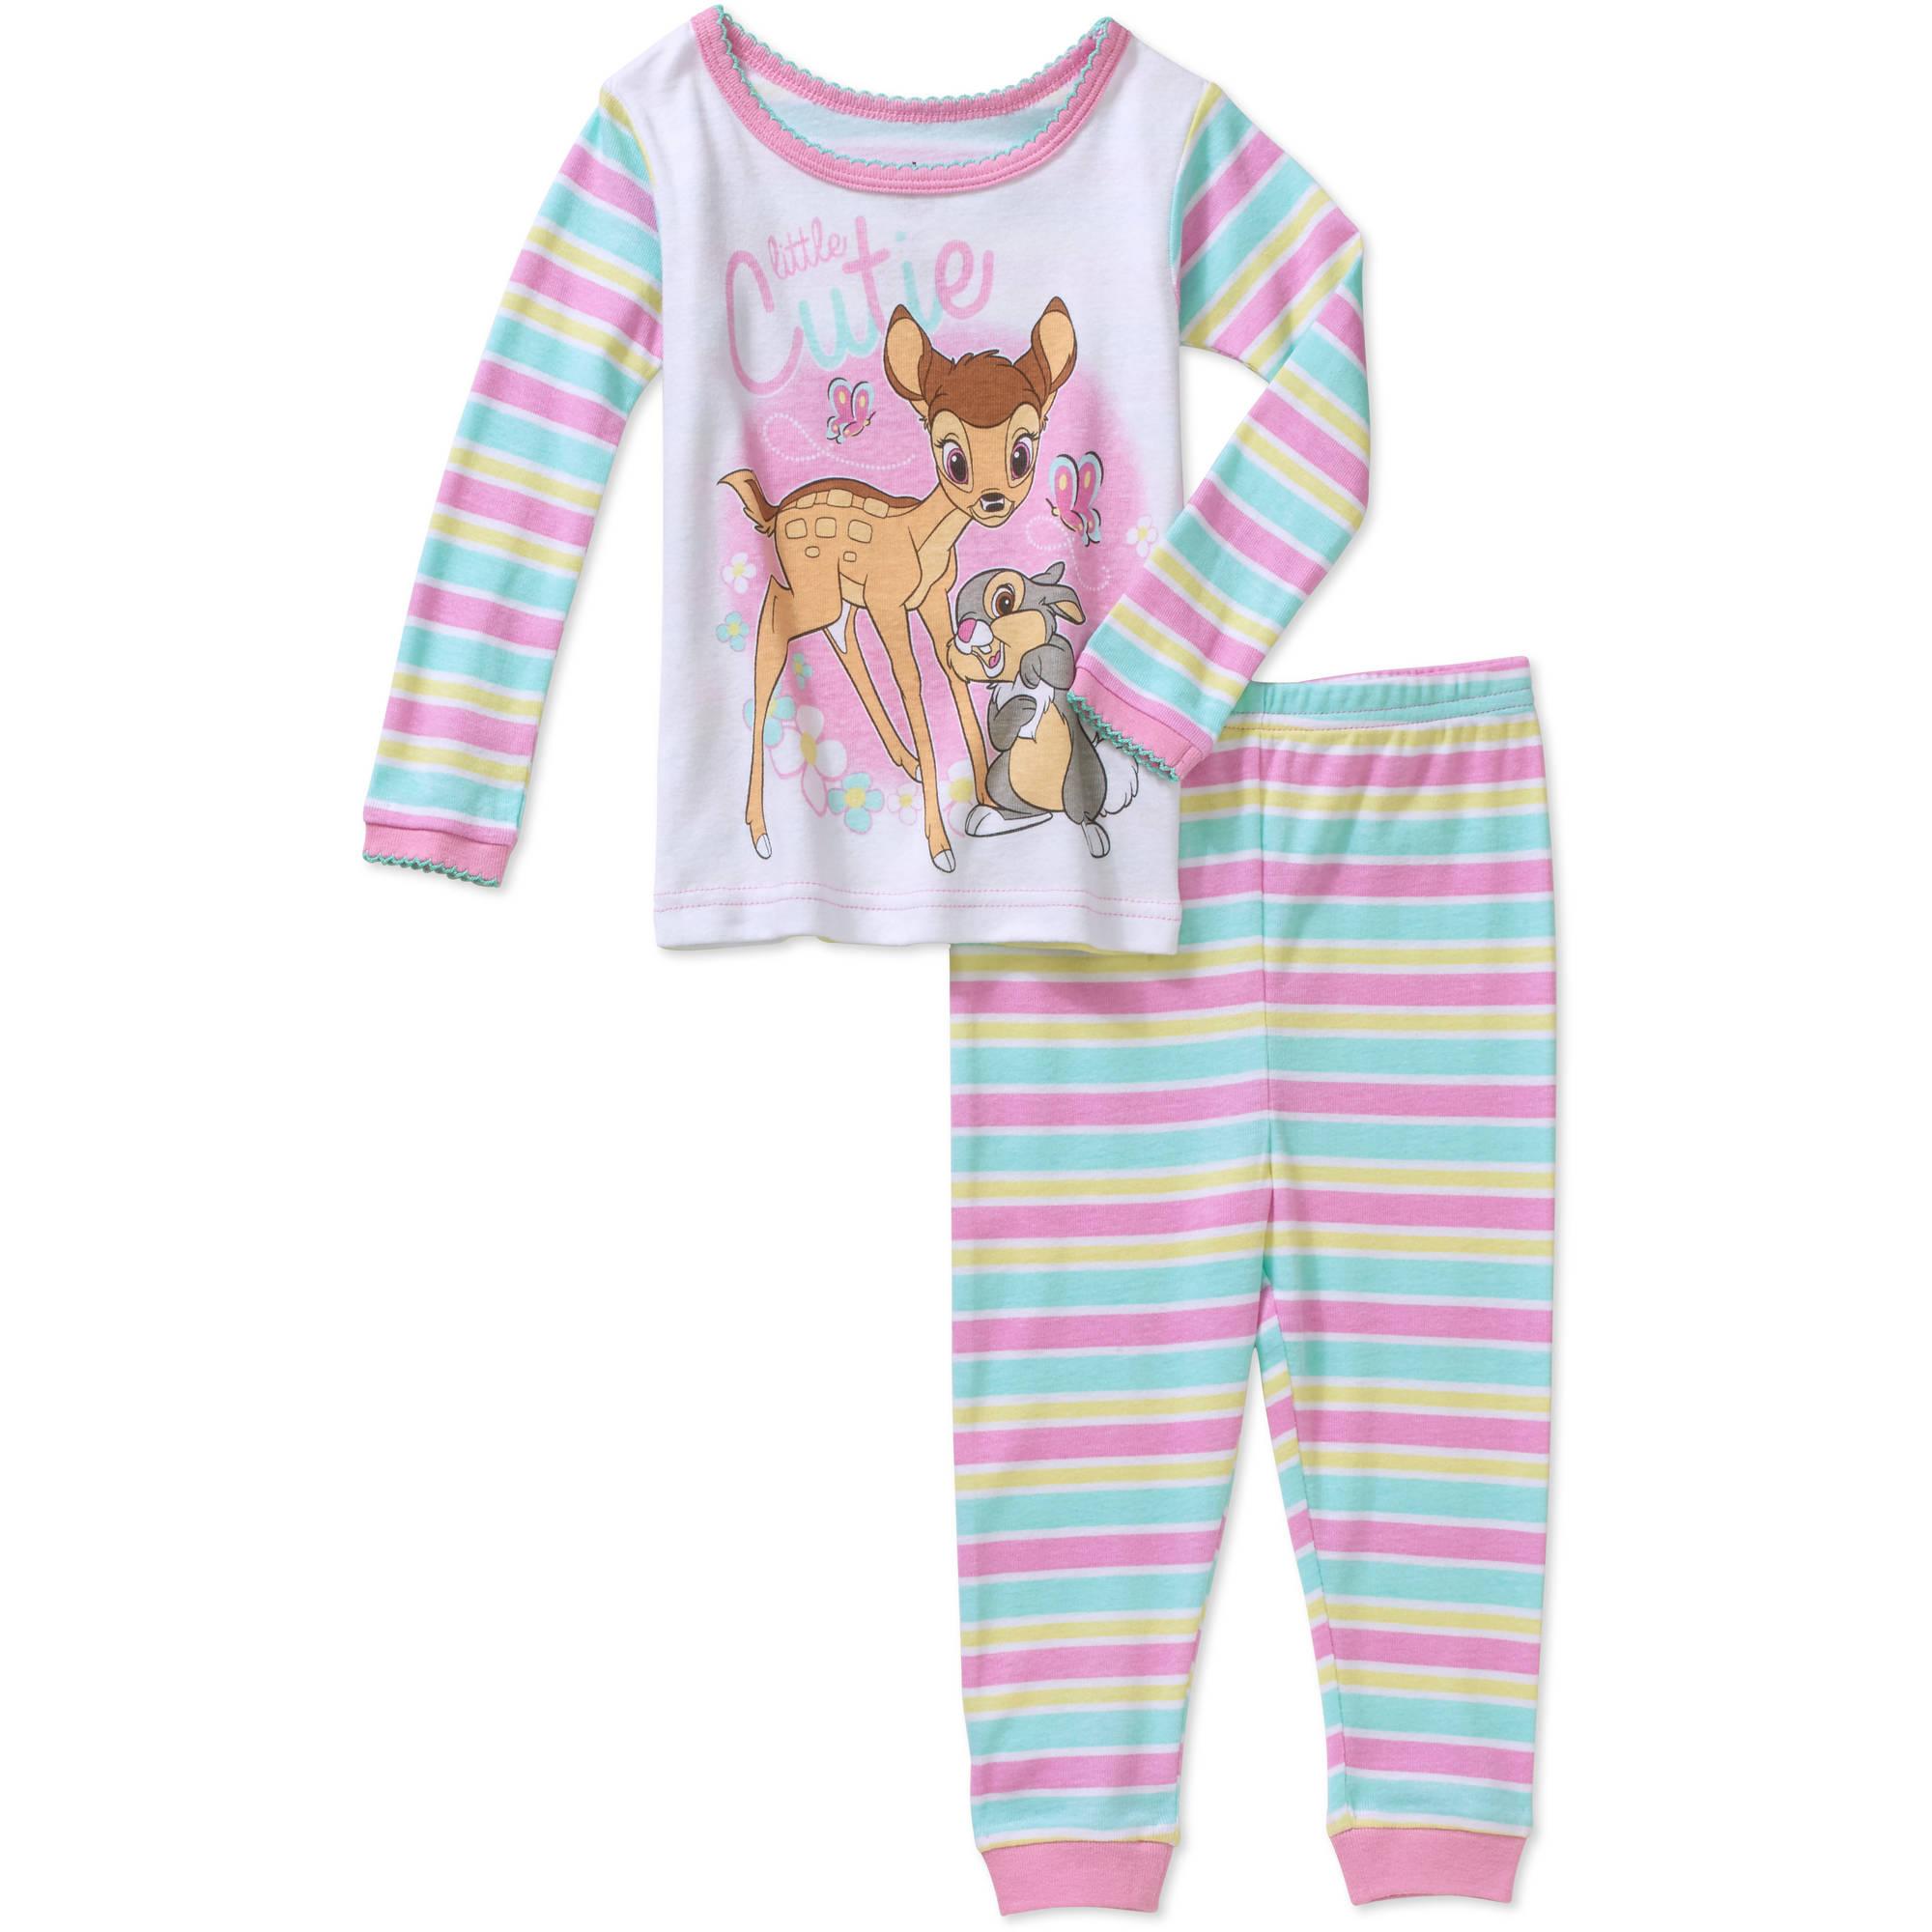 Bambi Newborn Baby Girl Little Cutie Cotton Tight Fit Pajamas 2pc Set